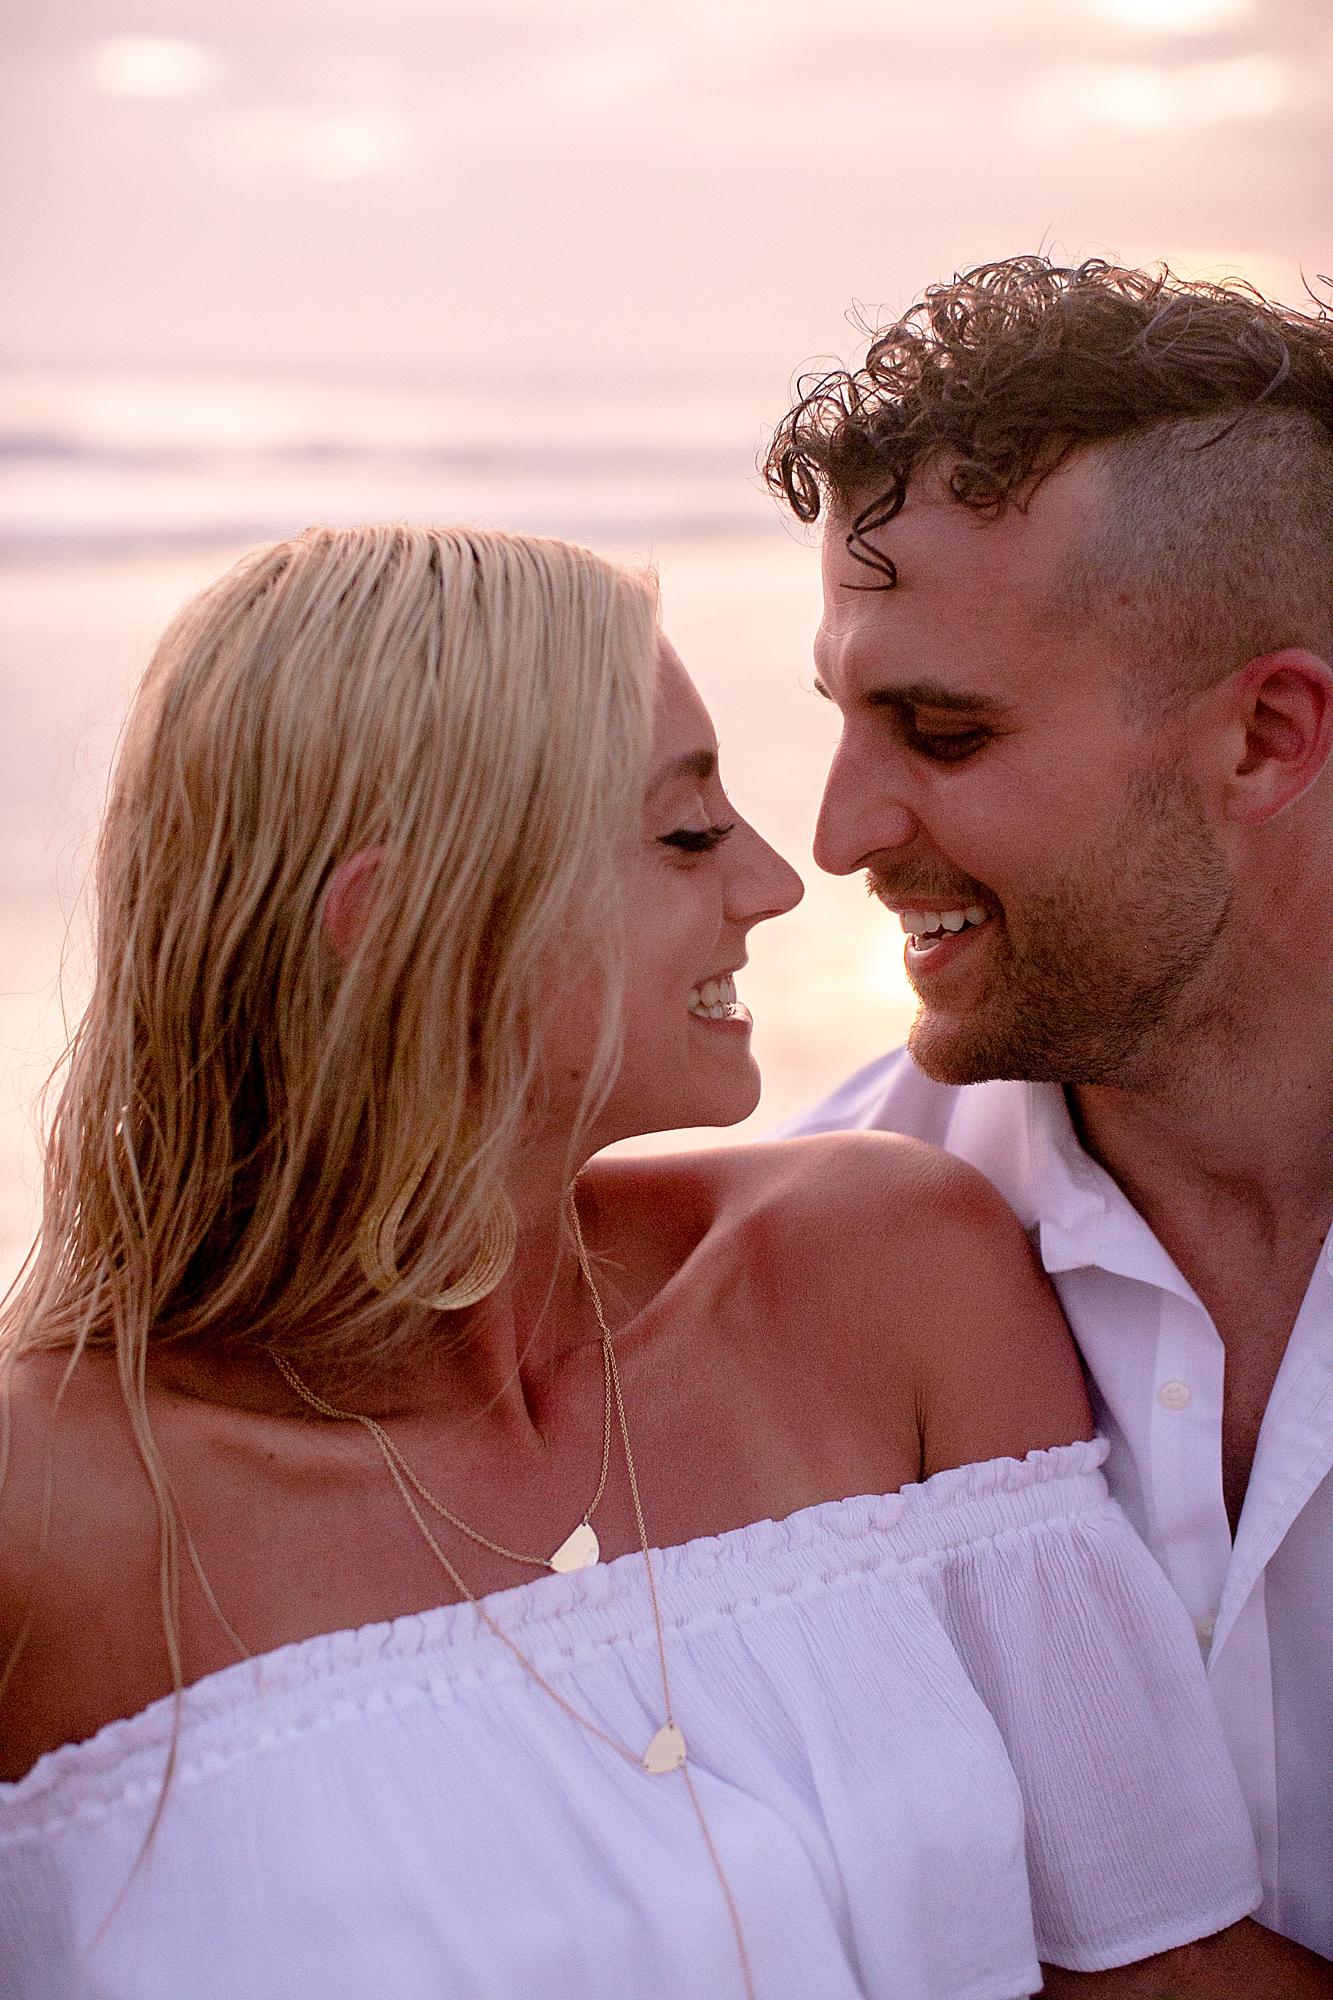 Epic and Adventurous Travel Wedding and Portrait Photographer in Nosara, Costa Rica - Kelee Bovelle @xokelee @keleeb - 29.jpg